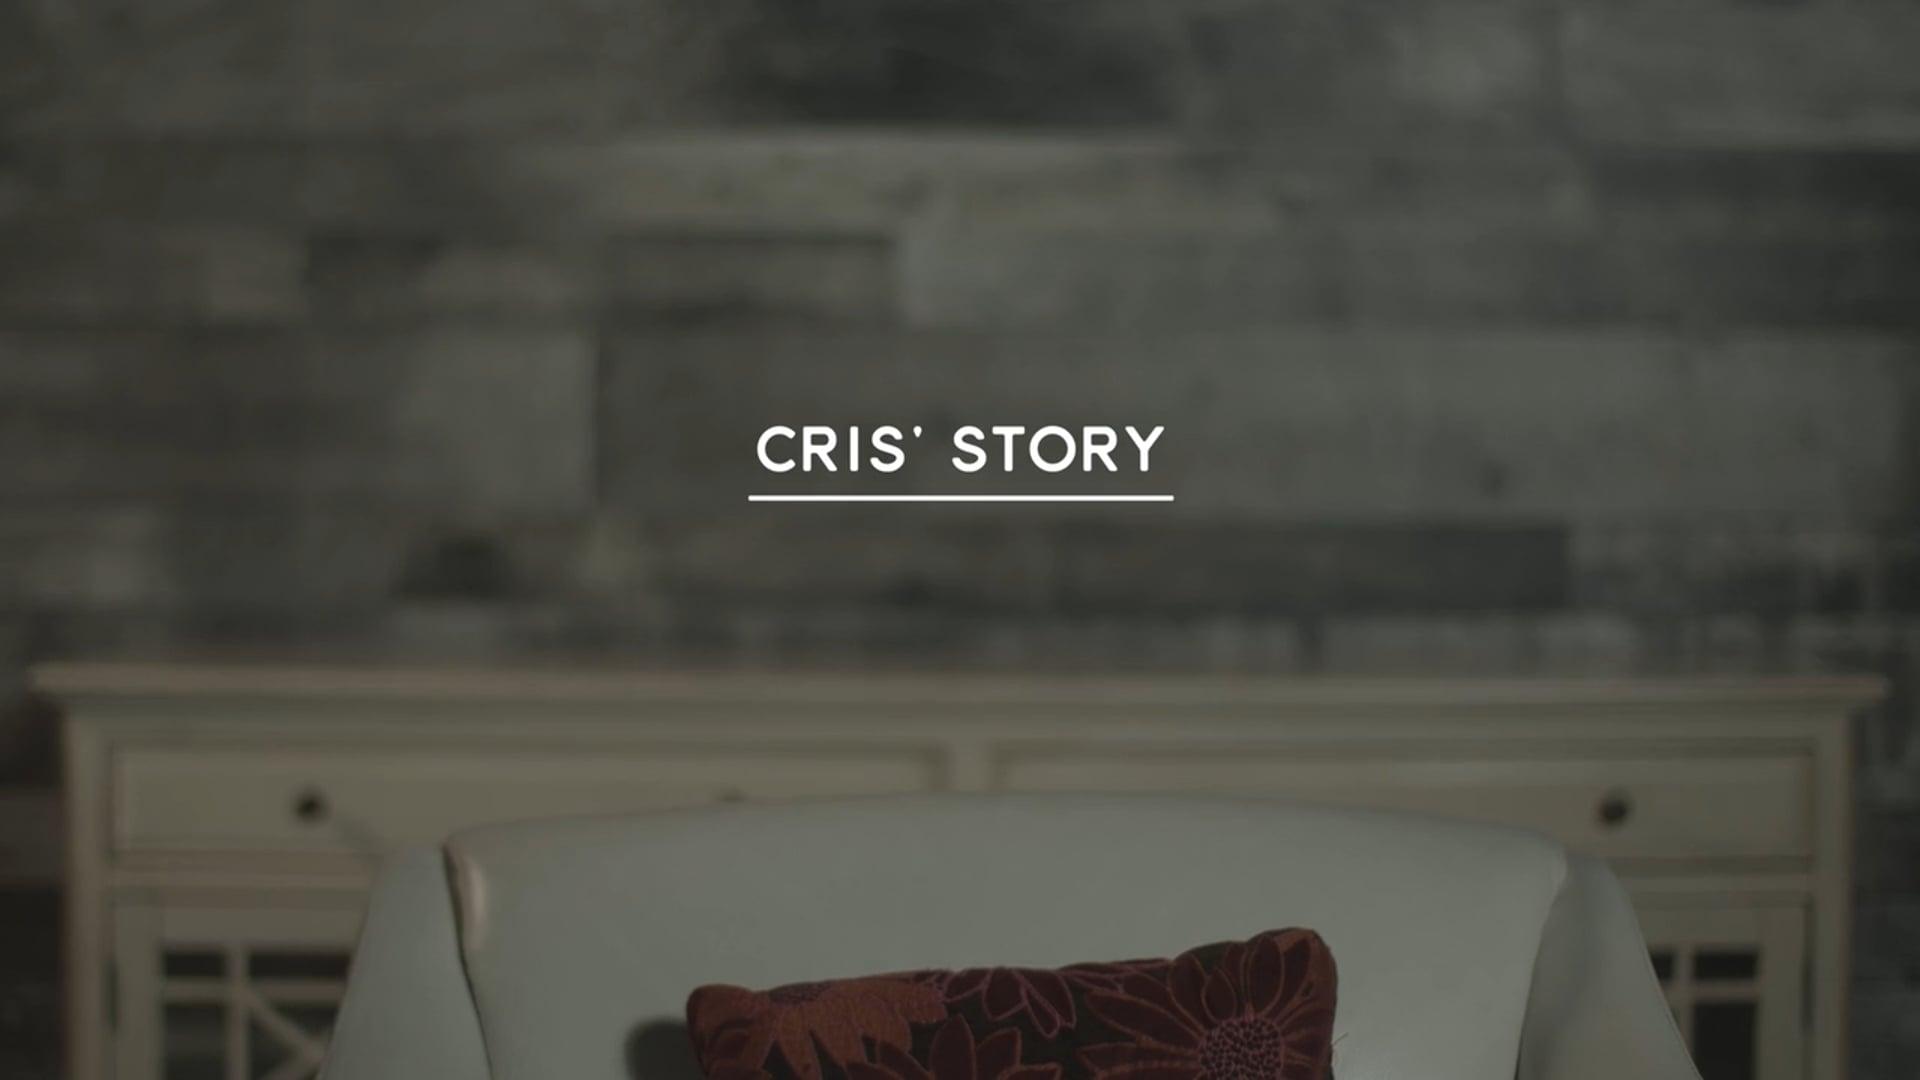 Cris' Story